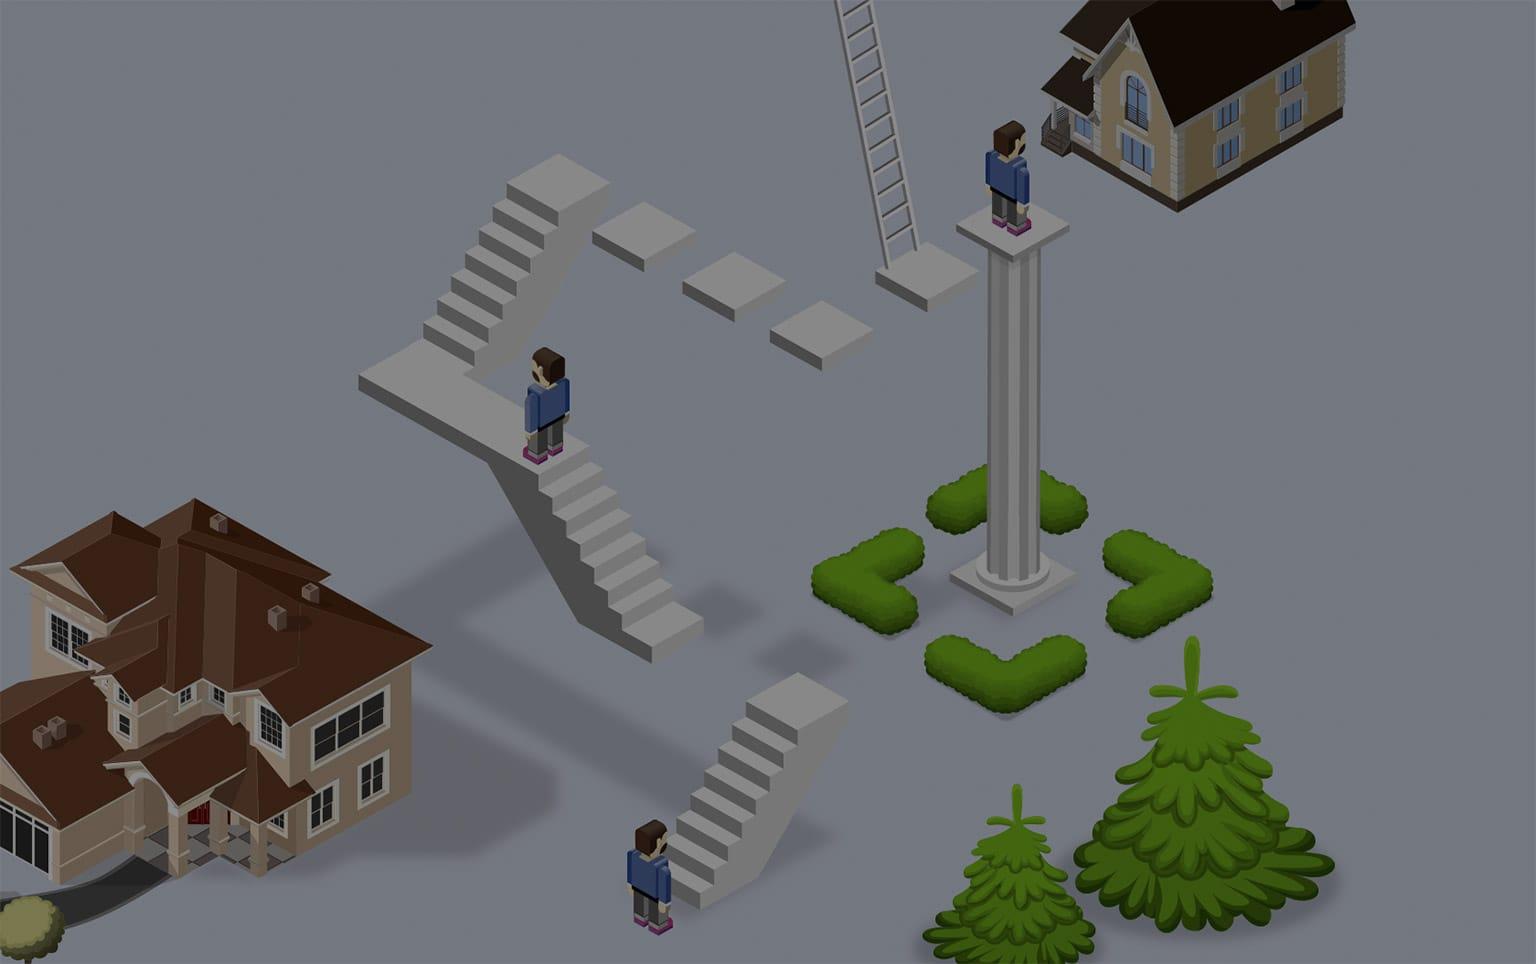 Property ladder. A quiz. Get on the ladder